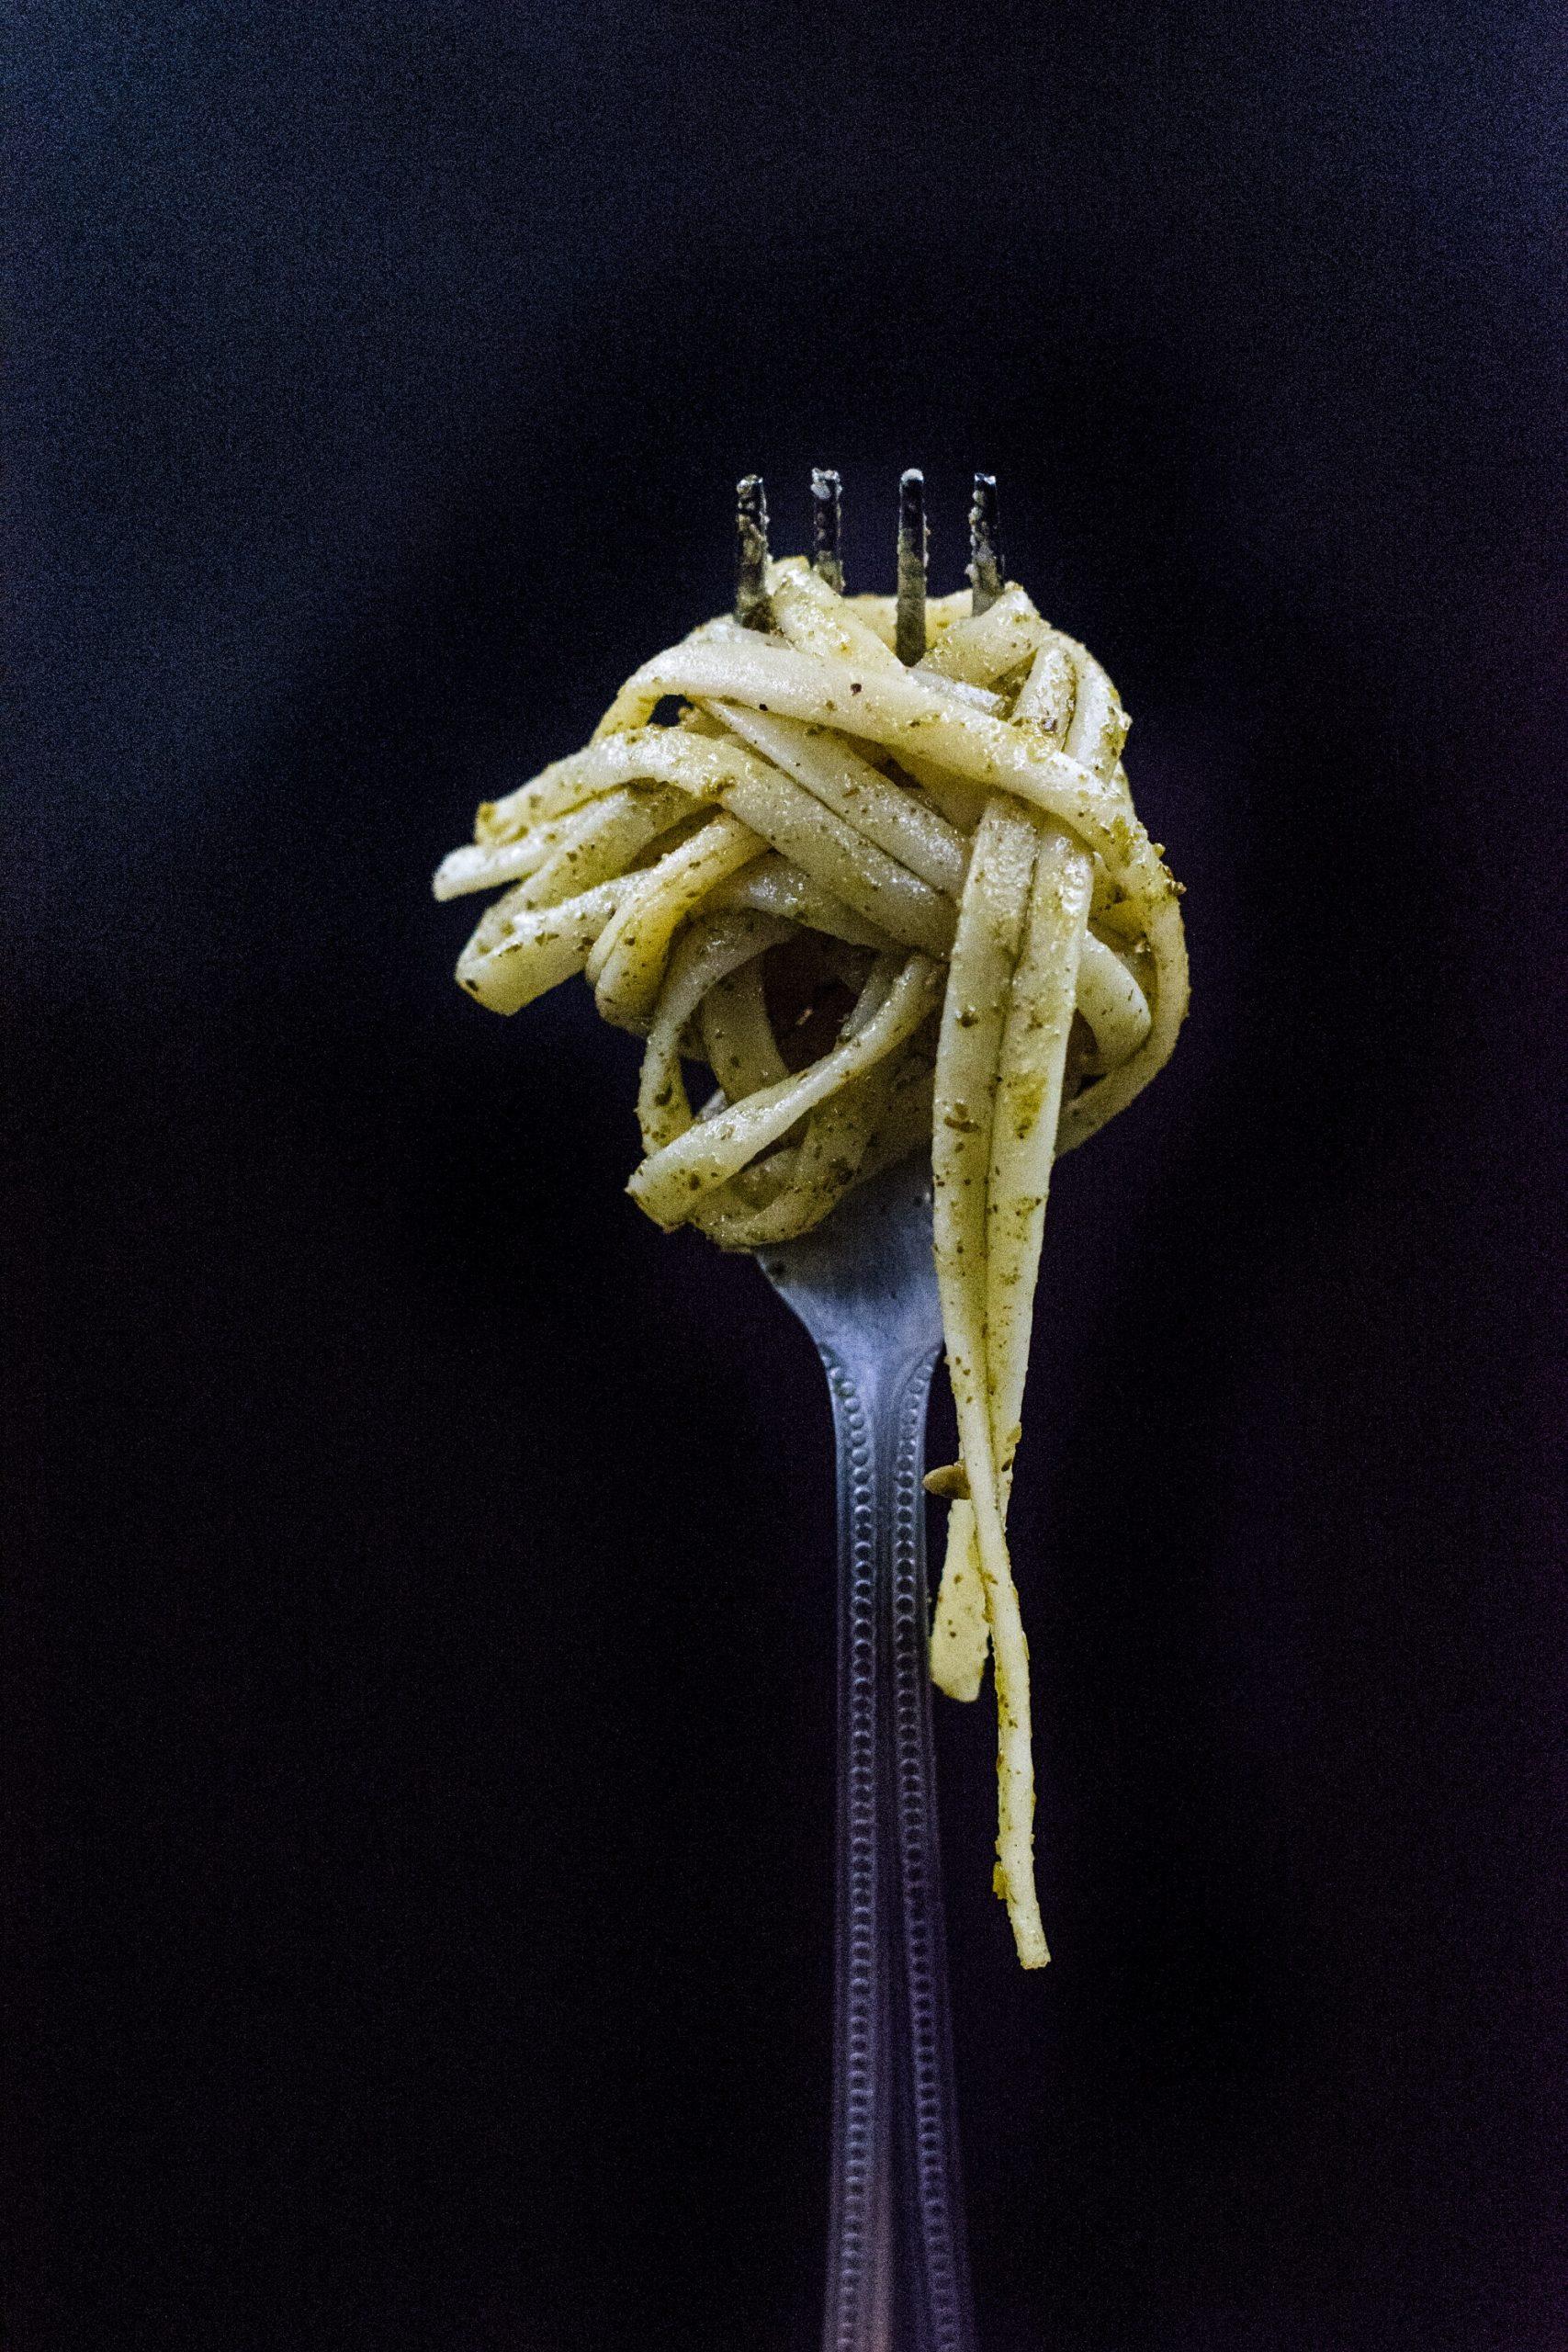 #FoodAndTravel: Pasta pesto day